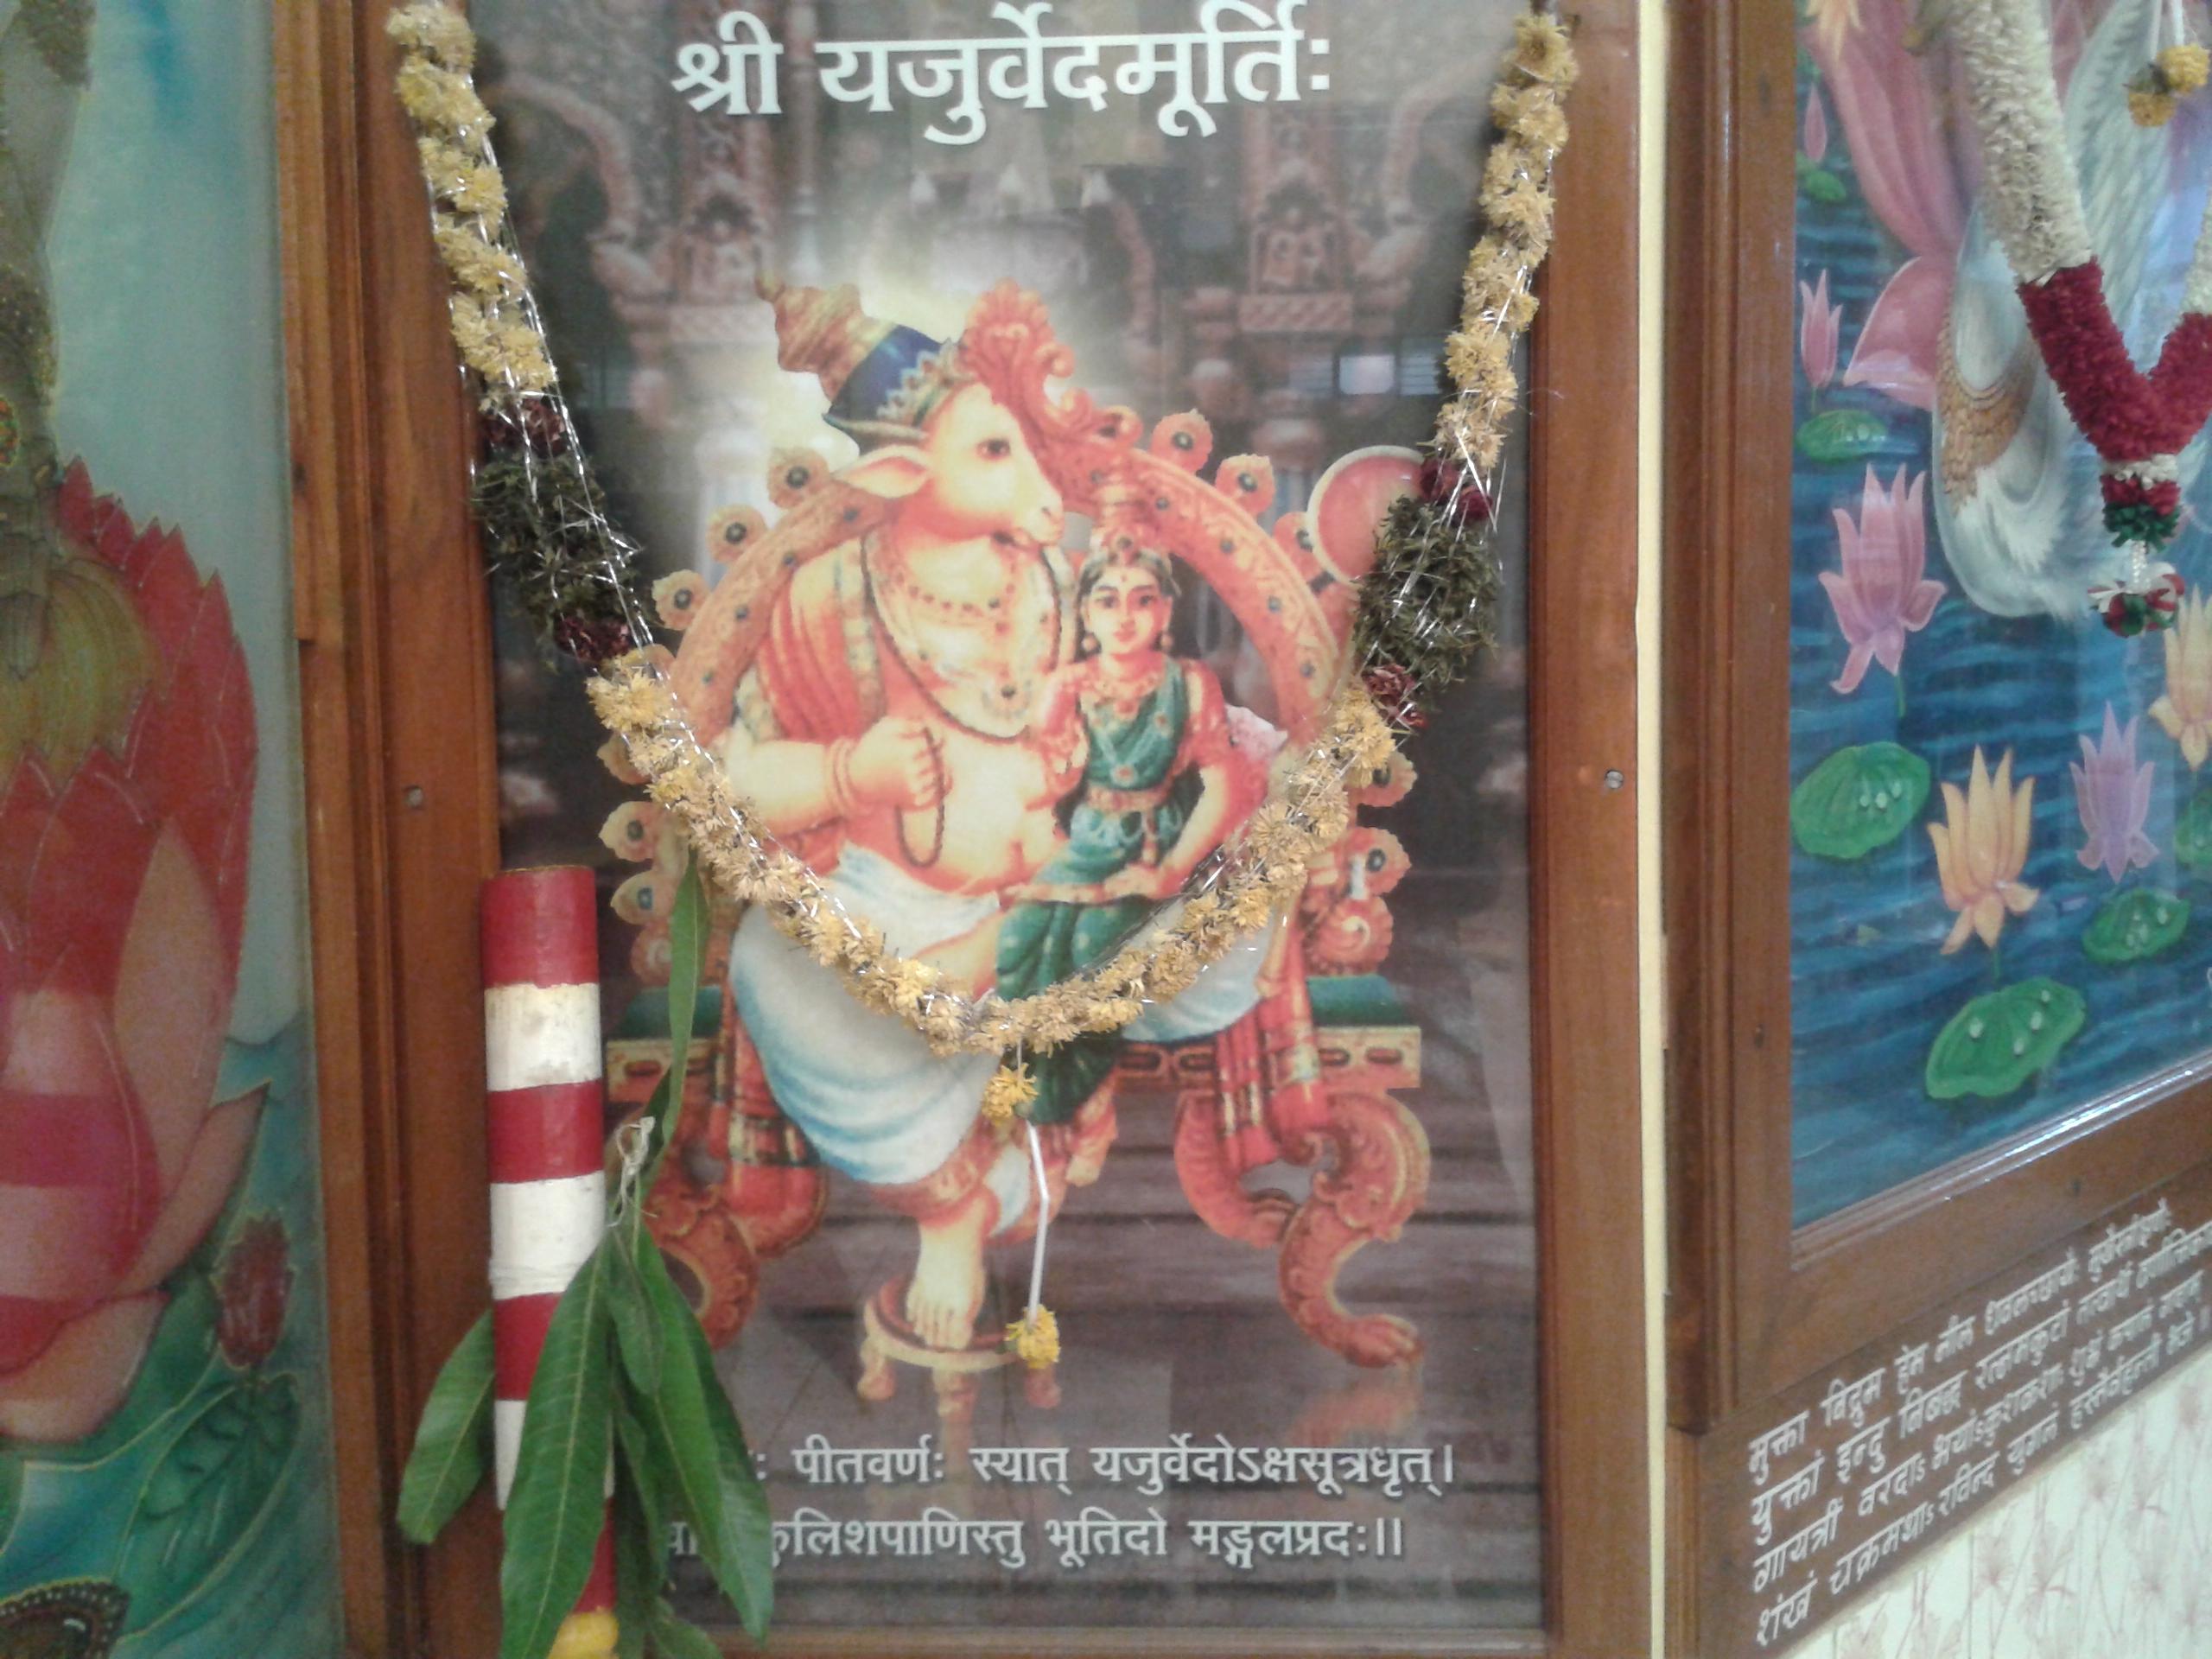 Rig Yajur Sama Atharva Vedas Personified Images Ramani S Blog